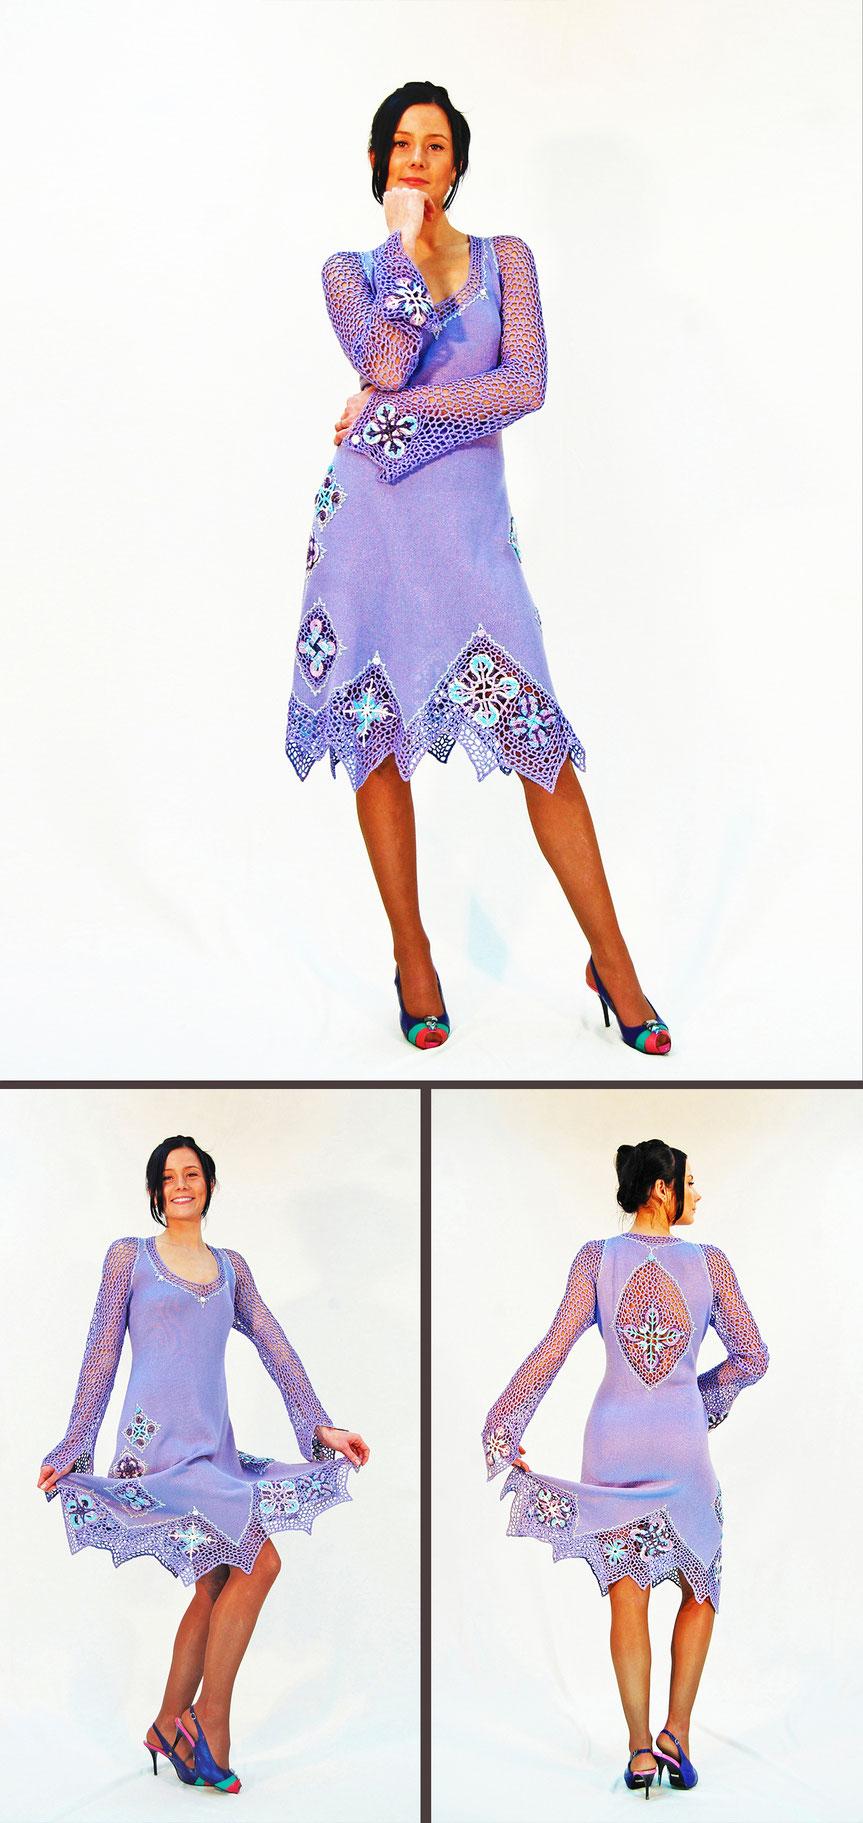 Alexander Seraphim's knitwear, 2010